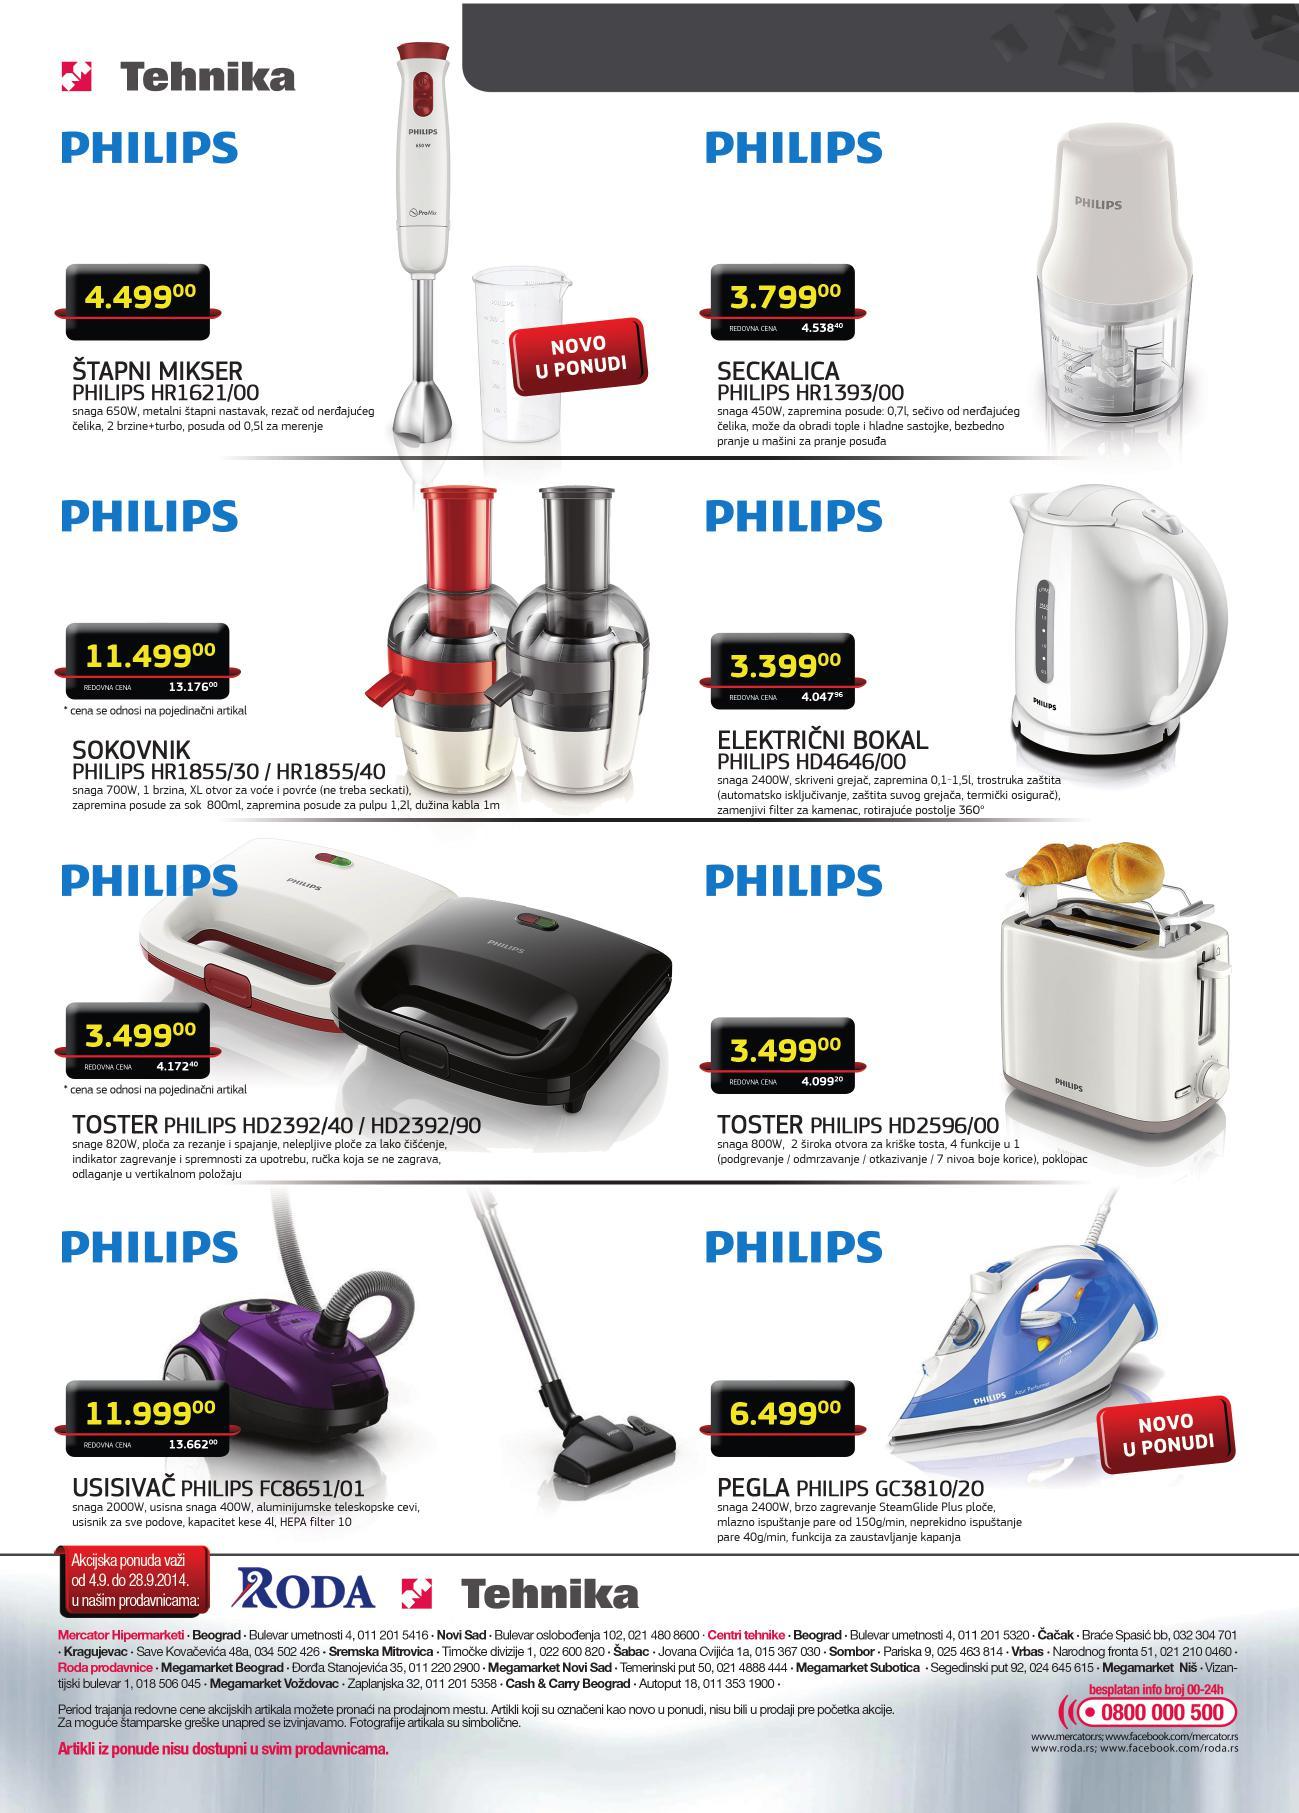 Roda akcija Philips tehnika